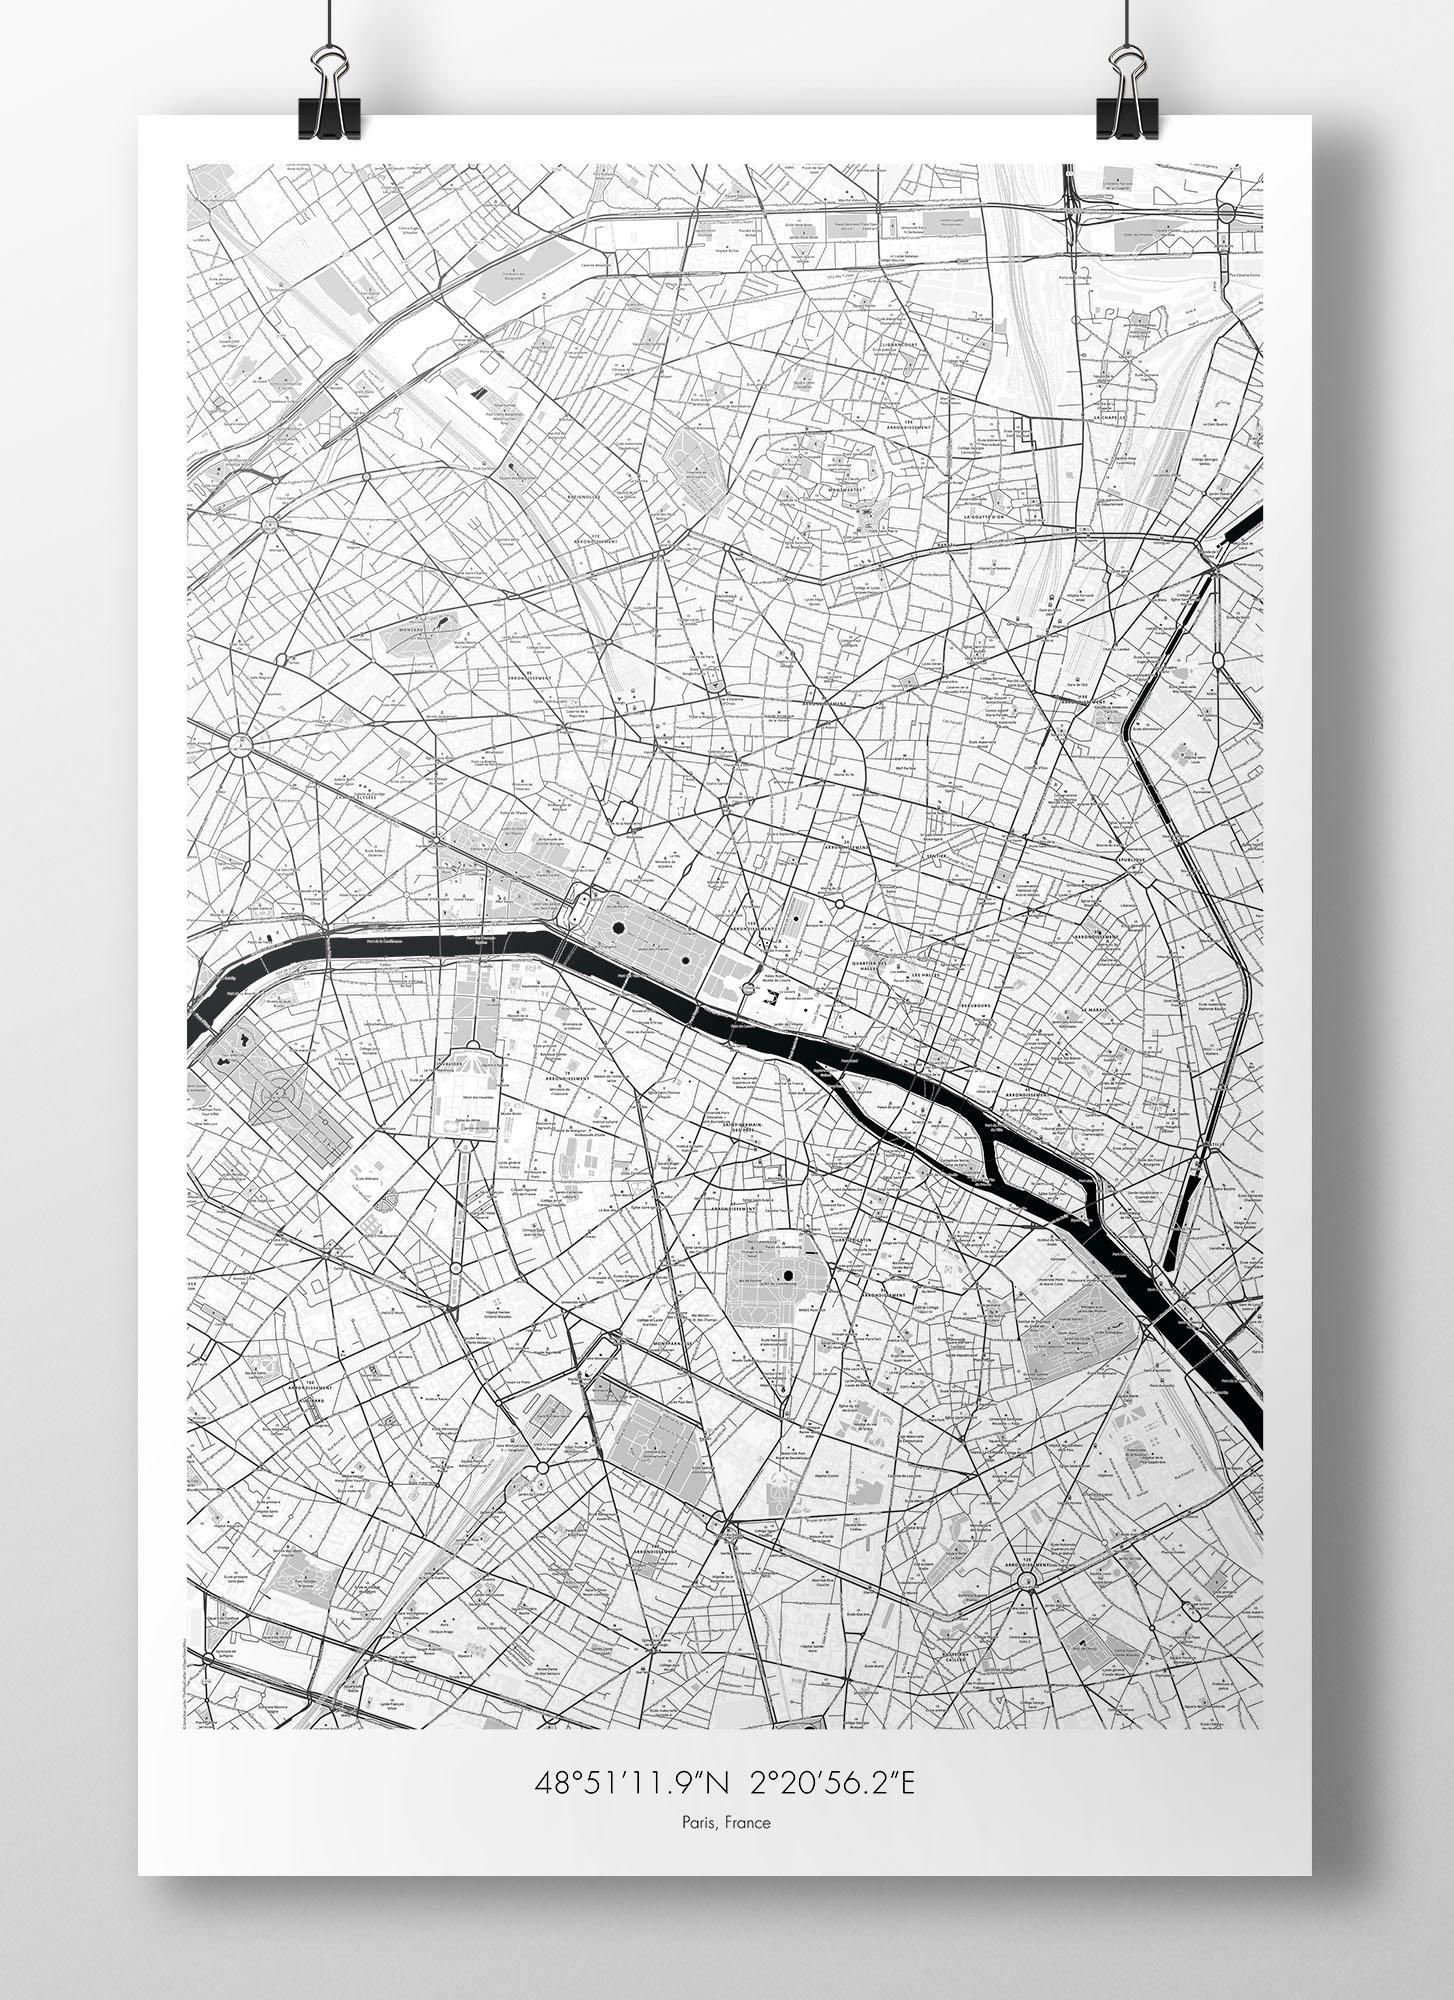 Image of Paris Map Poster - B&W